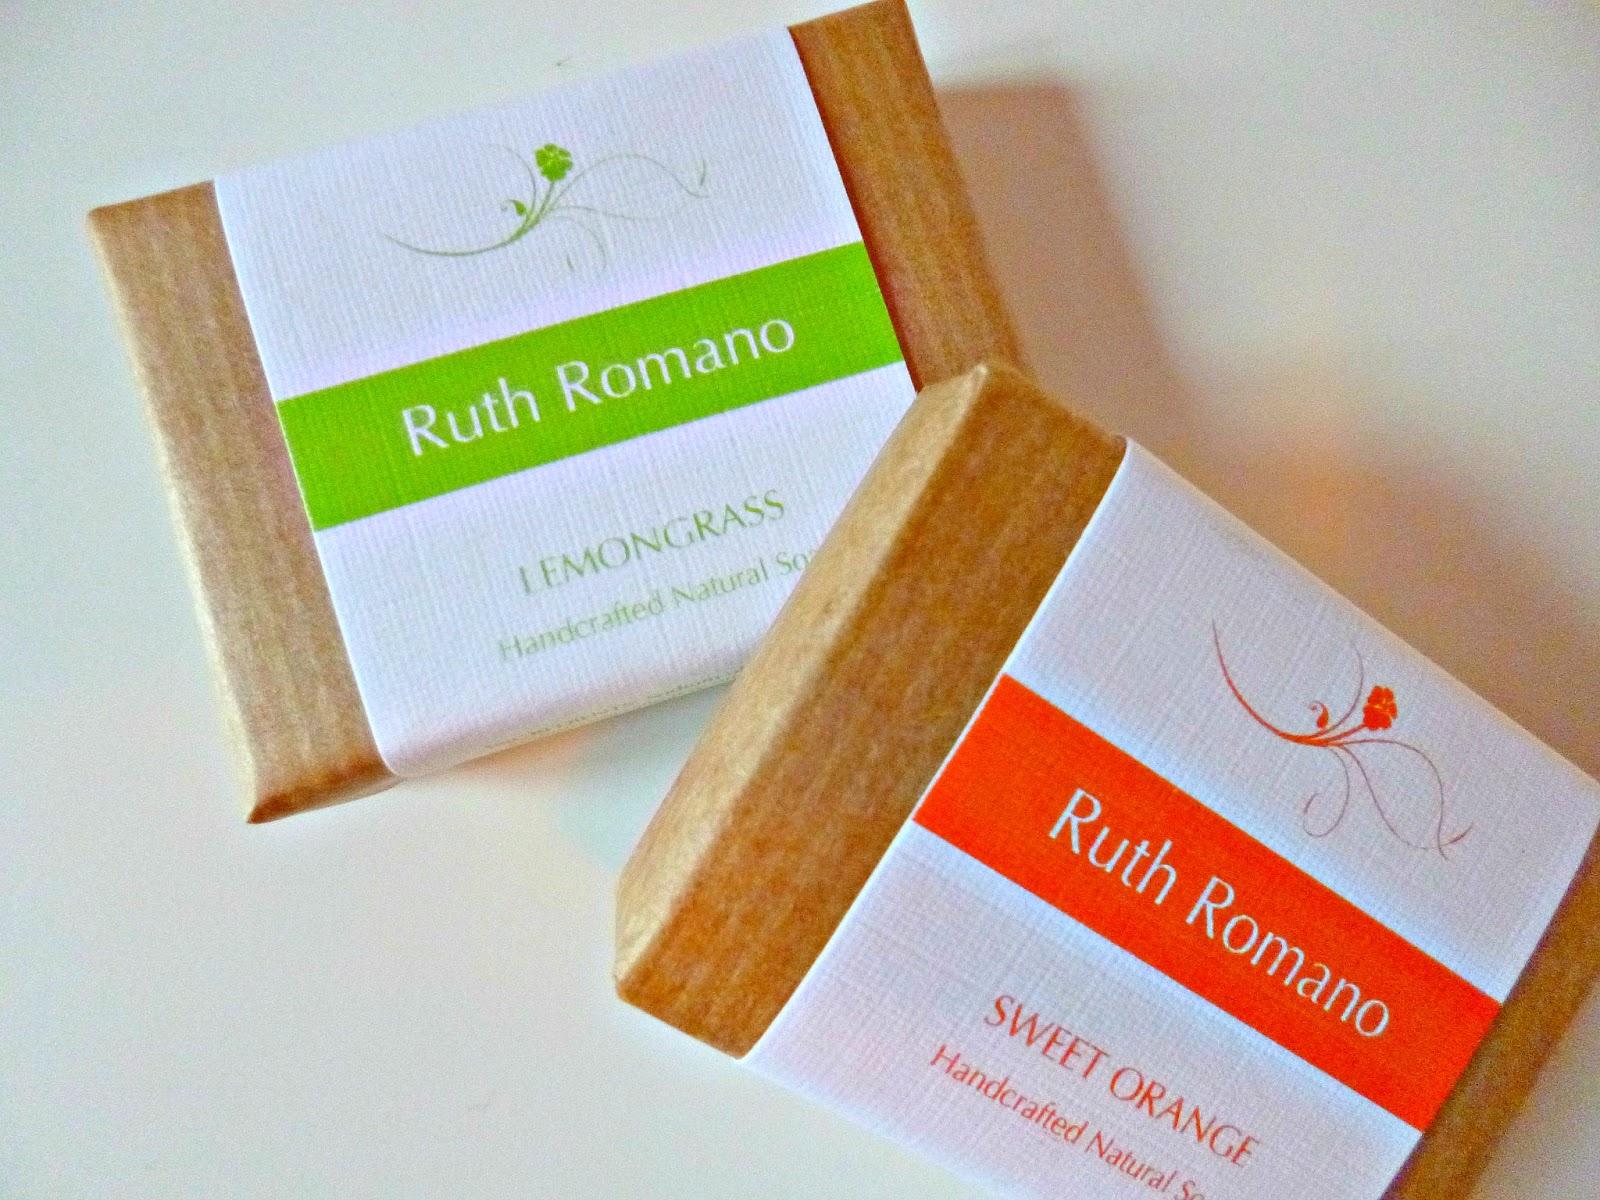 Ruth Romano soaps